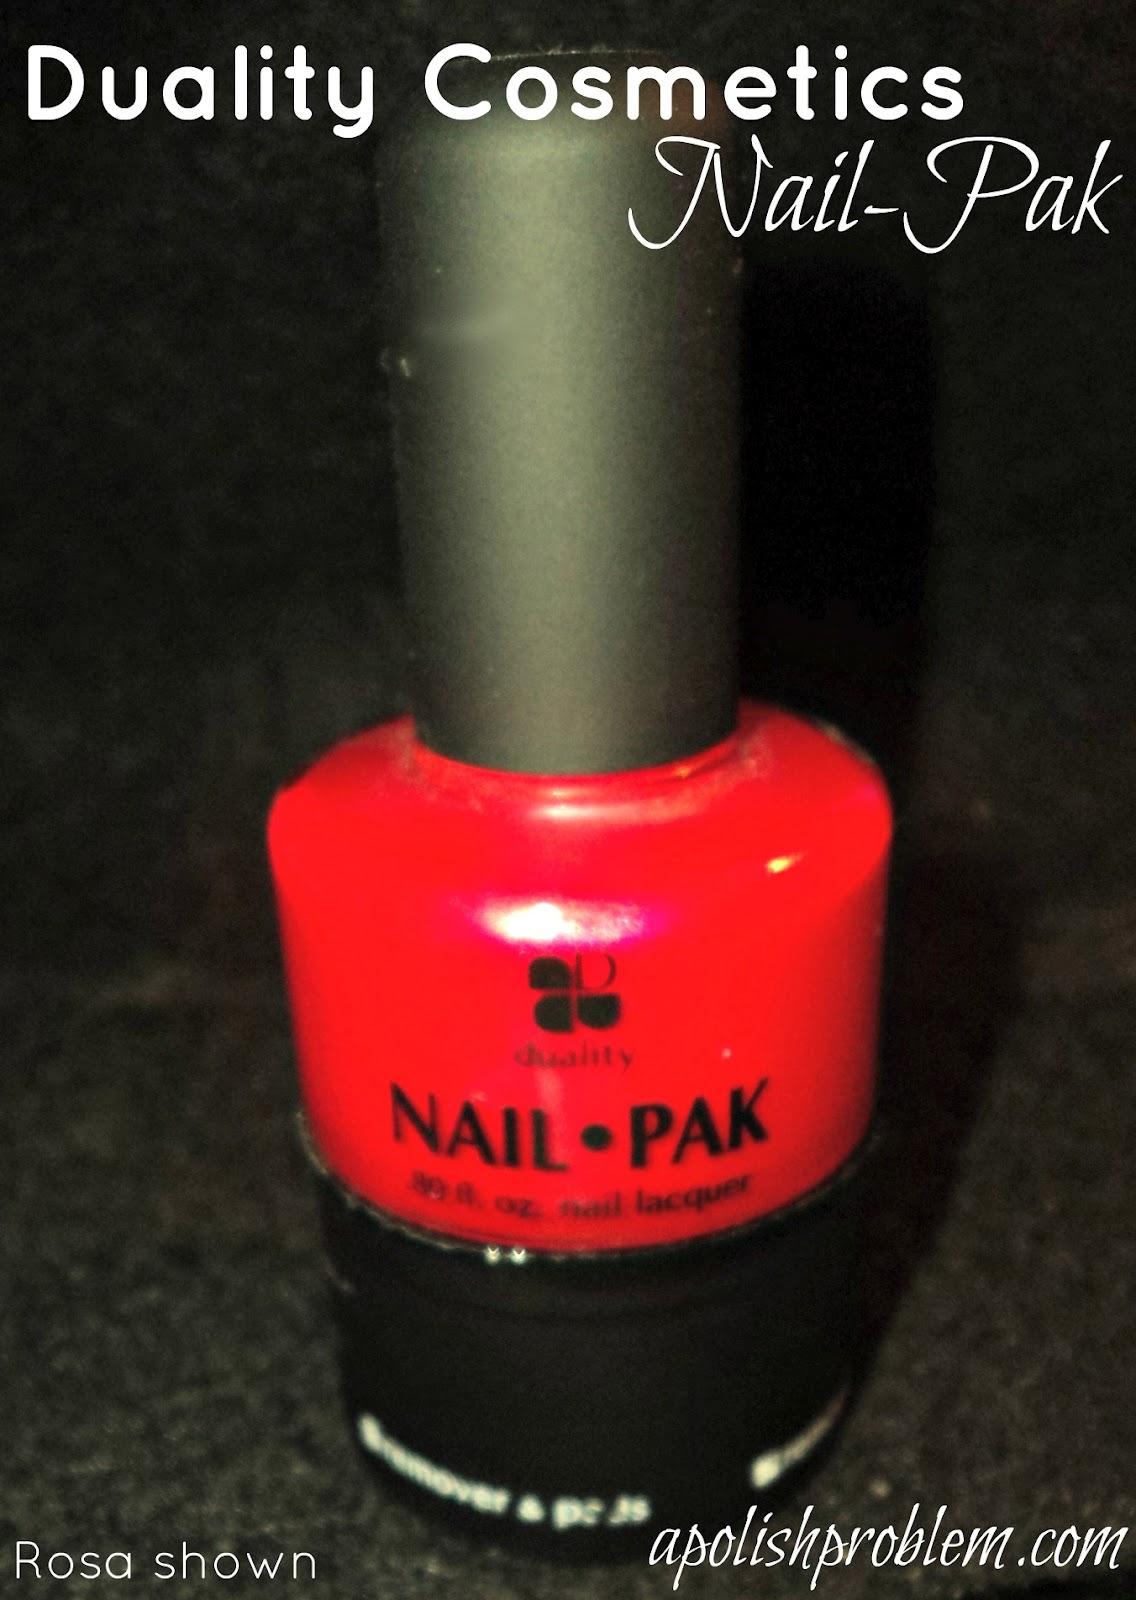 Nailpak : nailpak, Polish, Problem:, Duality, Cosmetics, Nail-Pak, Product, Review